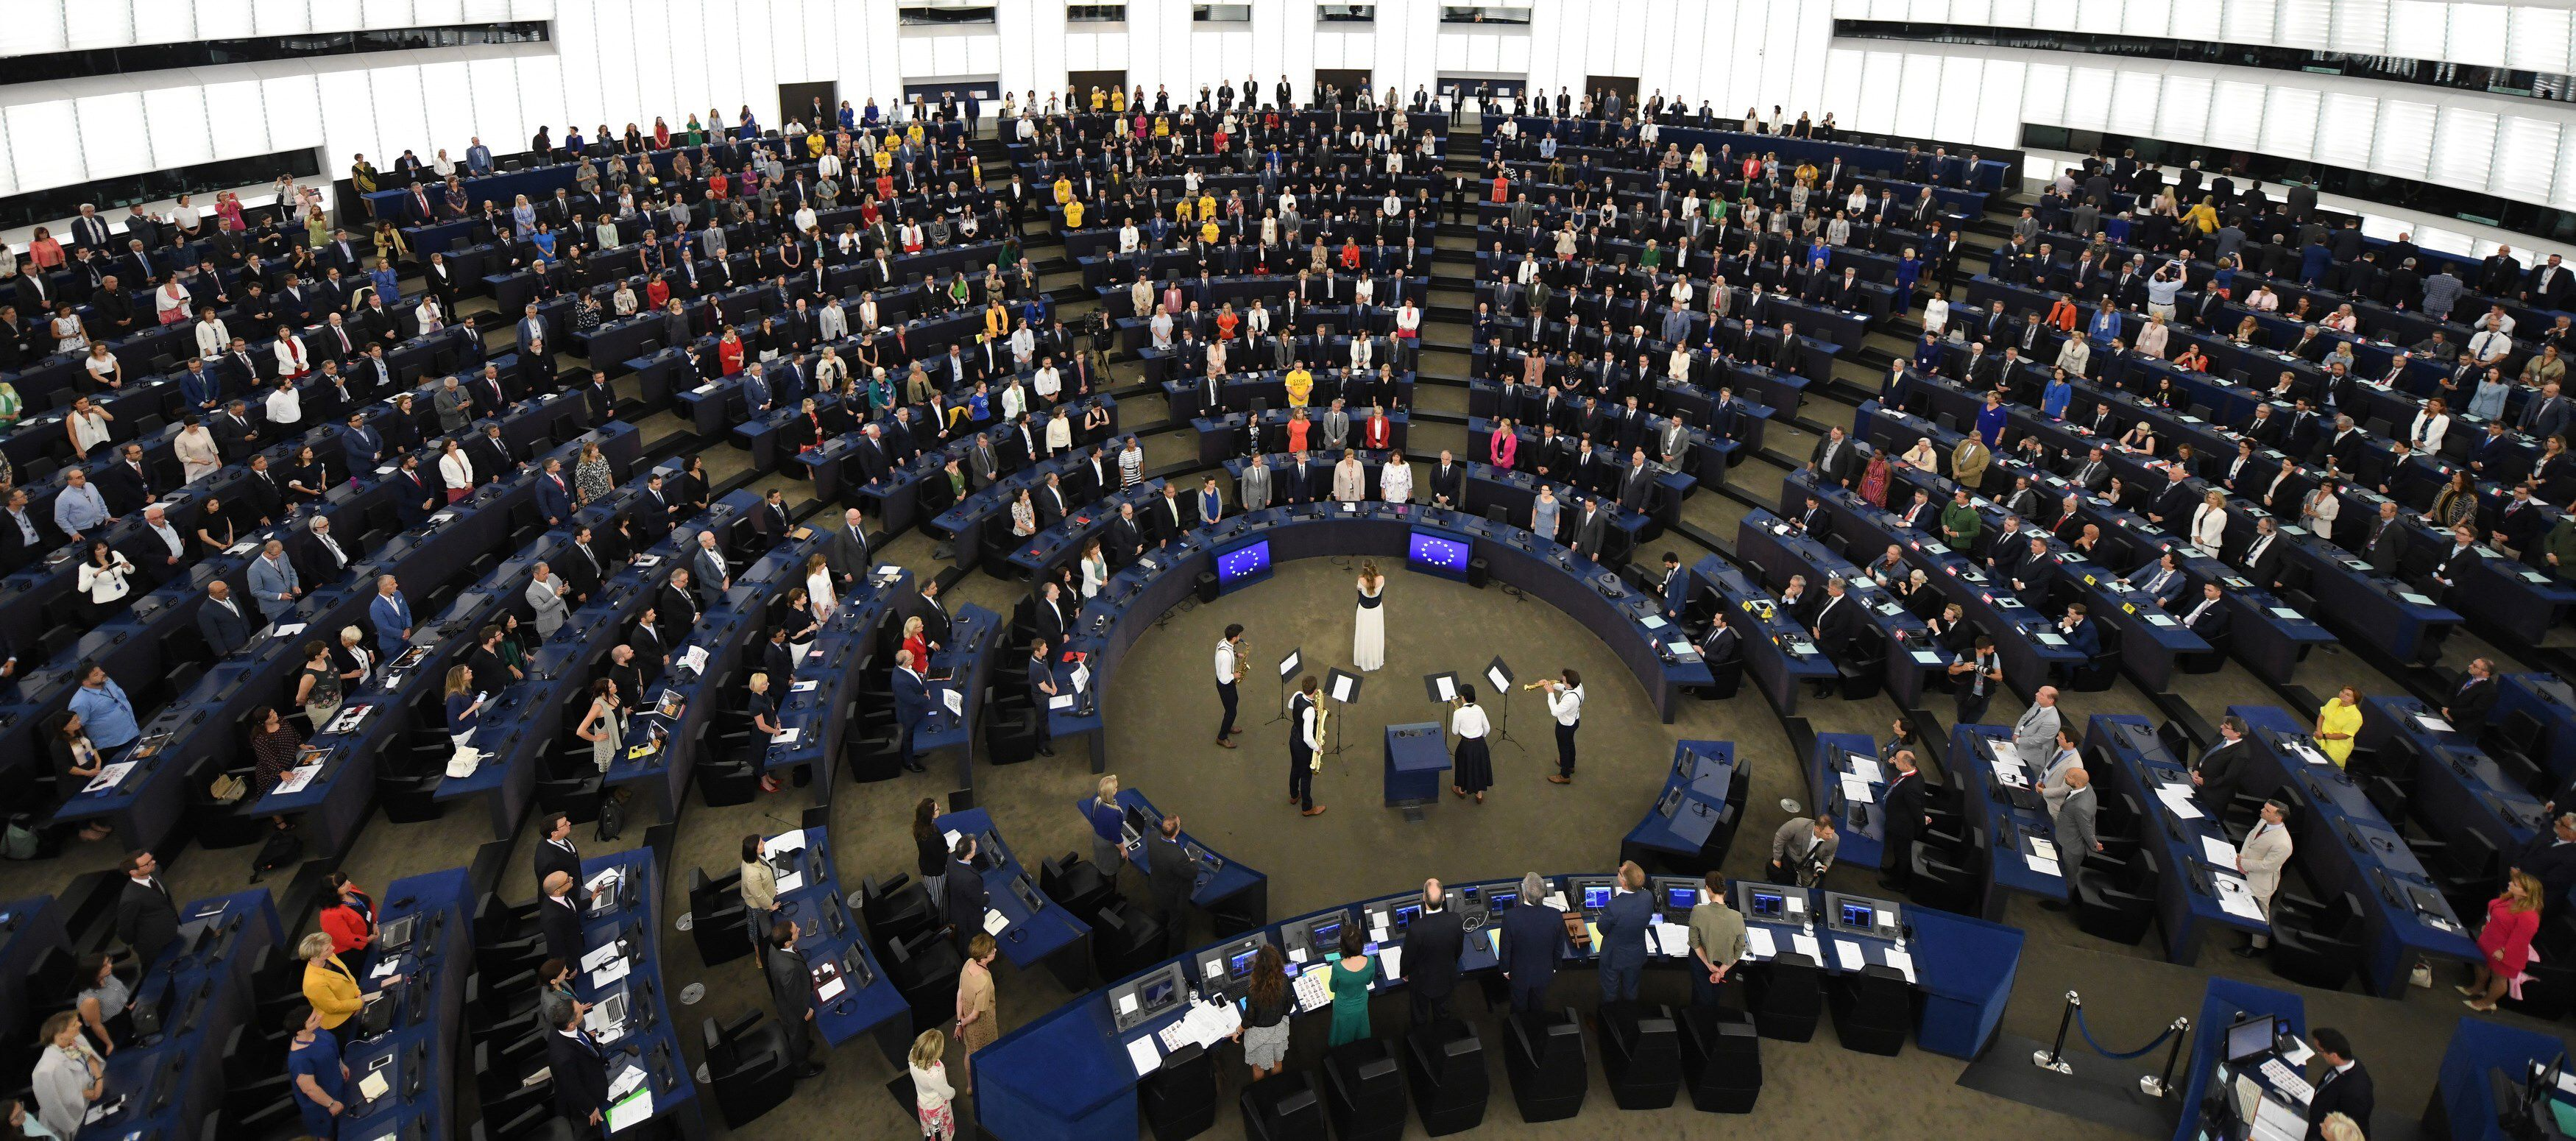 La Eurocámara retoma sus plenos en Estrasburgo tras la pandemia. EFE/ Patrick Seeger/Archivo